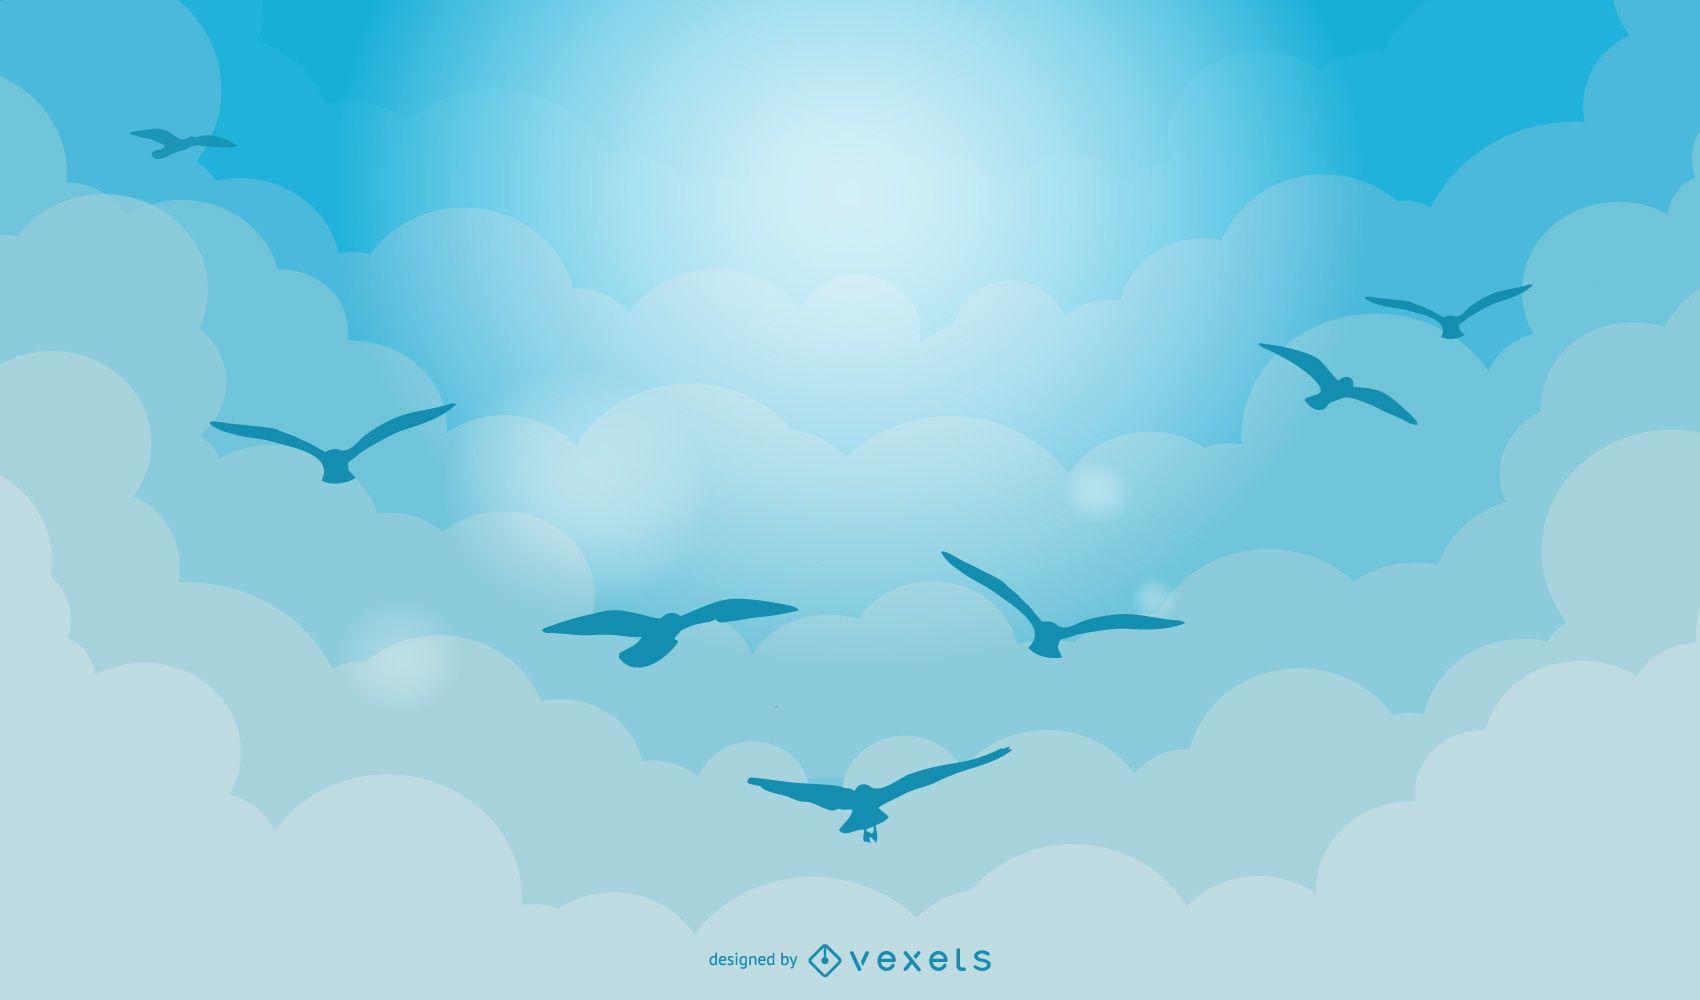 Gráfico de bandada de pájaros de cielo azul